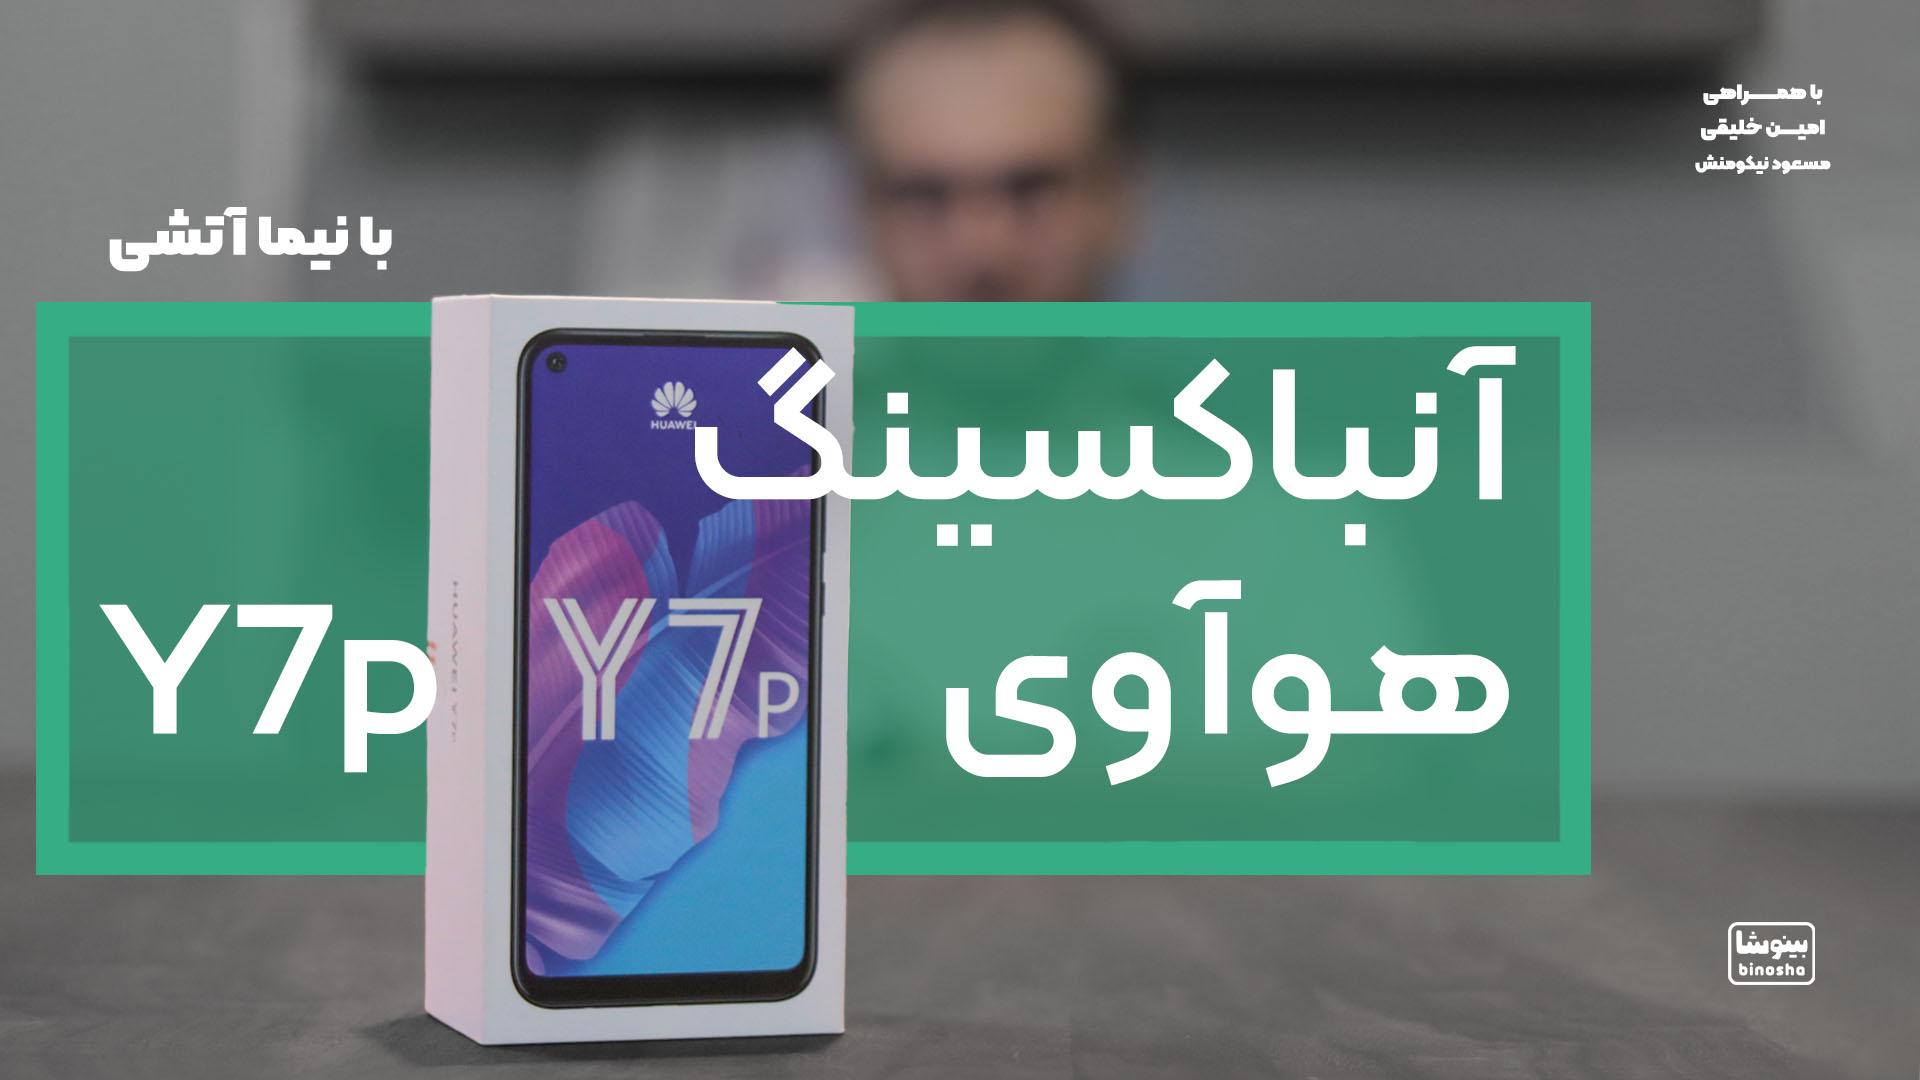 آنباکس گوشی هوآوی Y7p | Huawei Y7p unboxing